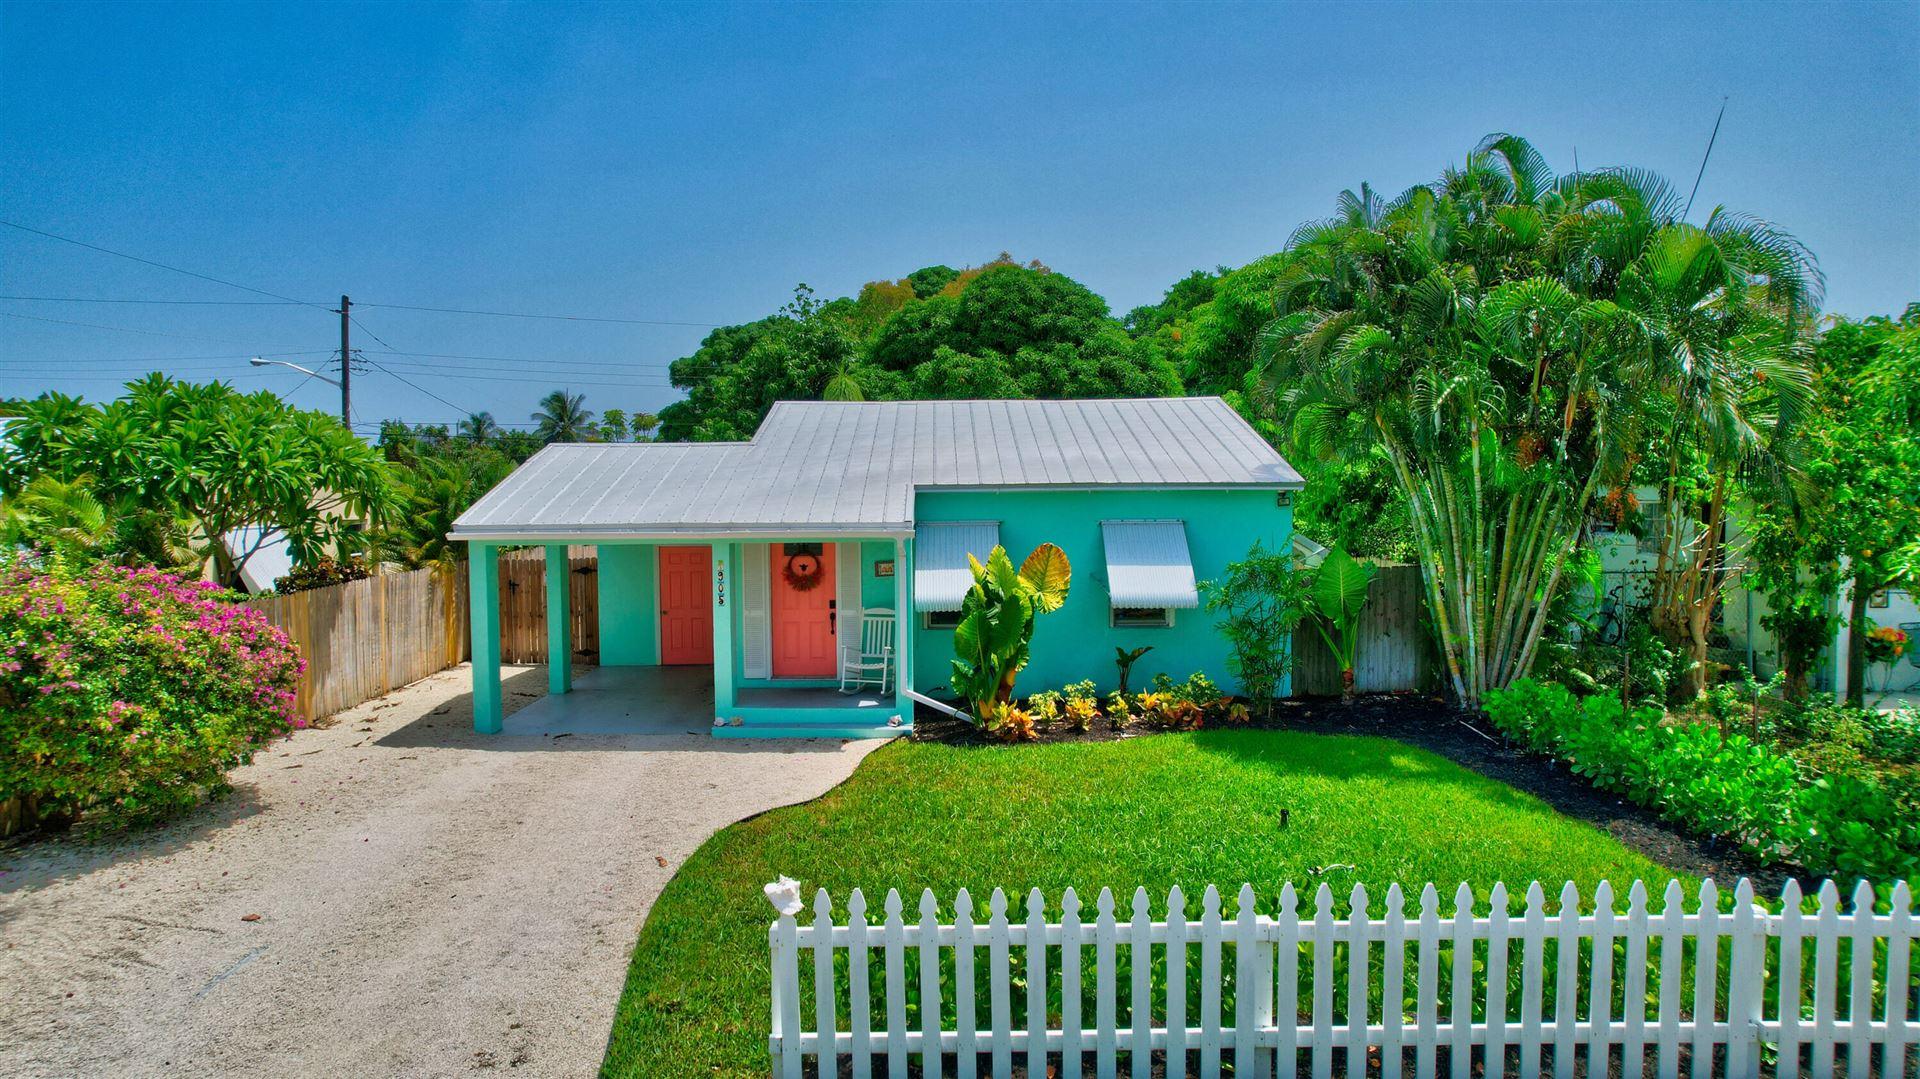 905 SE 2nd Avenue, Delray Beach, FL 33483 - MLS#: RX-10743747